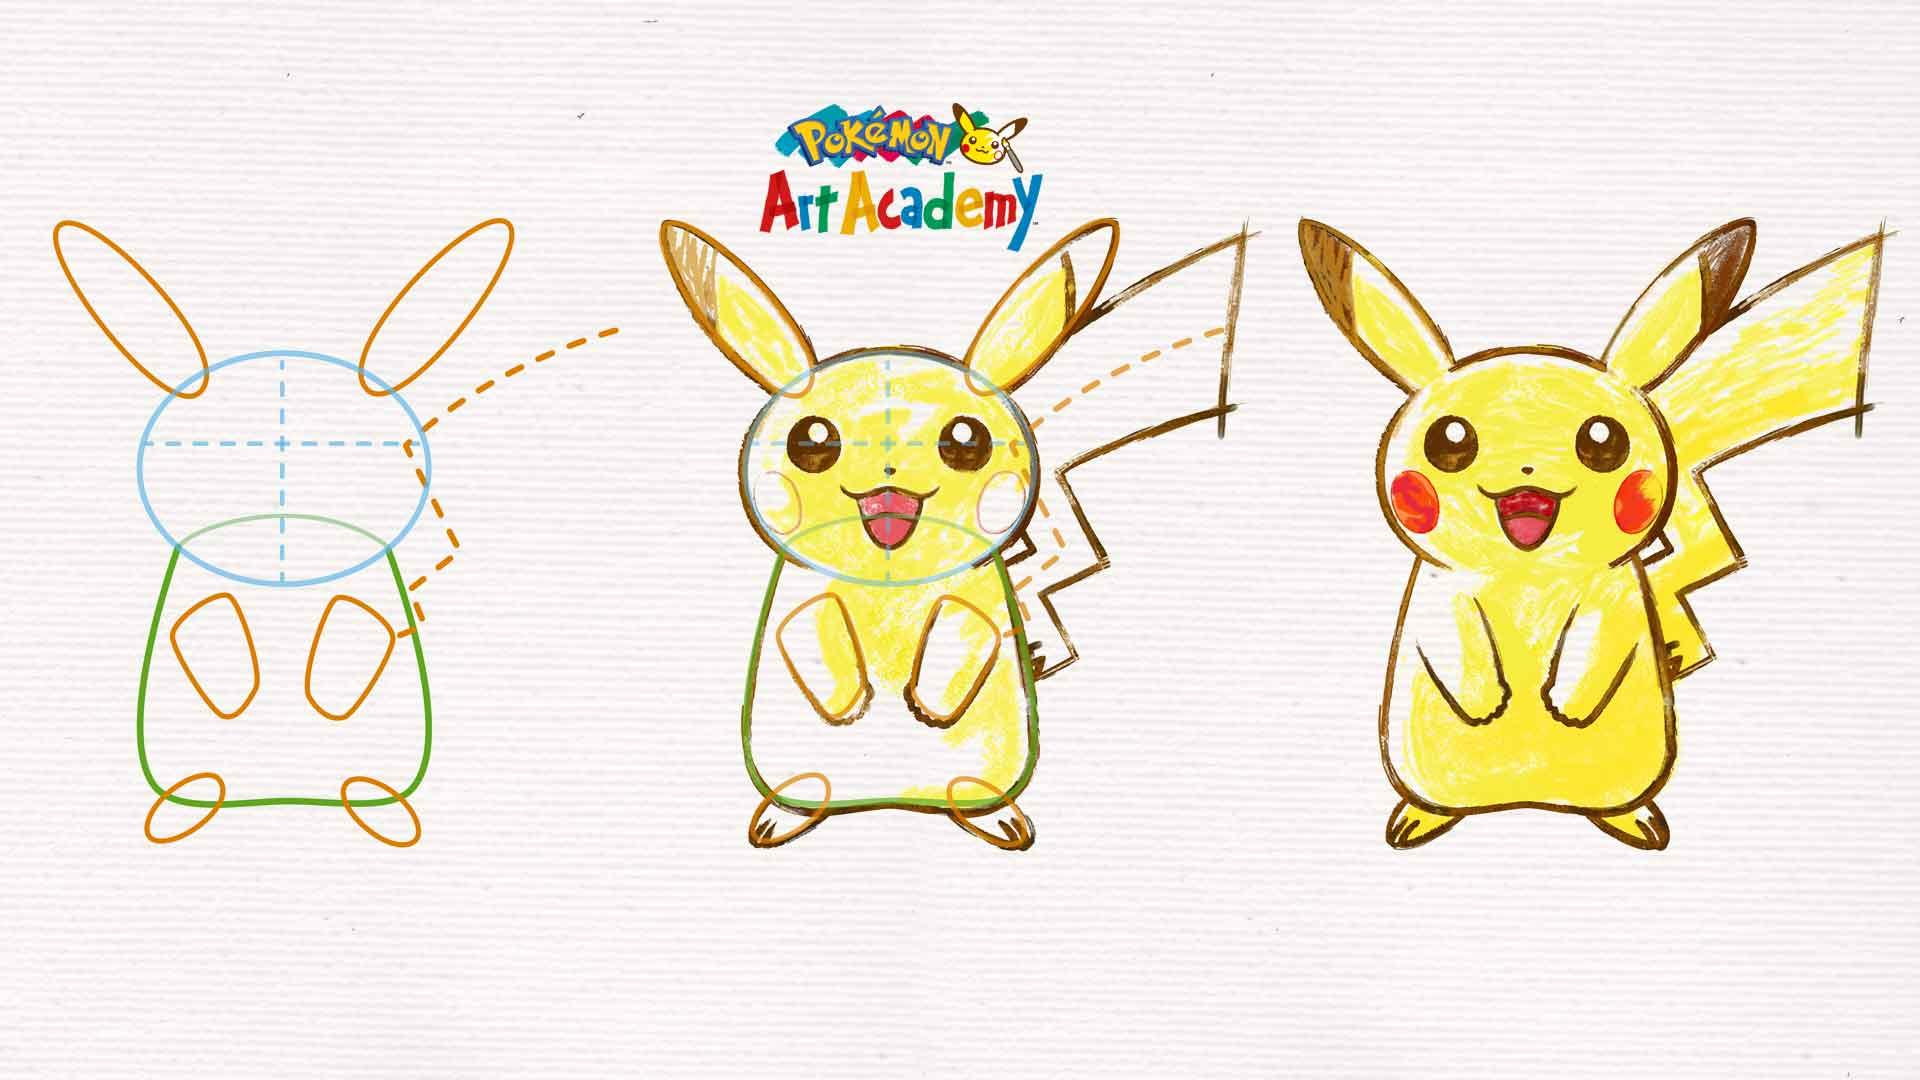 Pokemon-Art-Academy_4.jpg